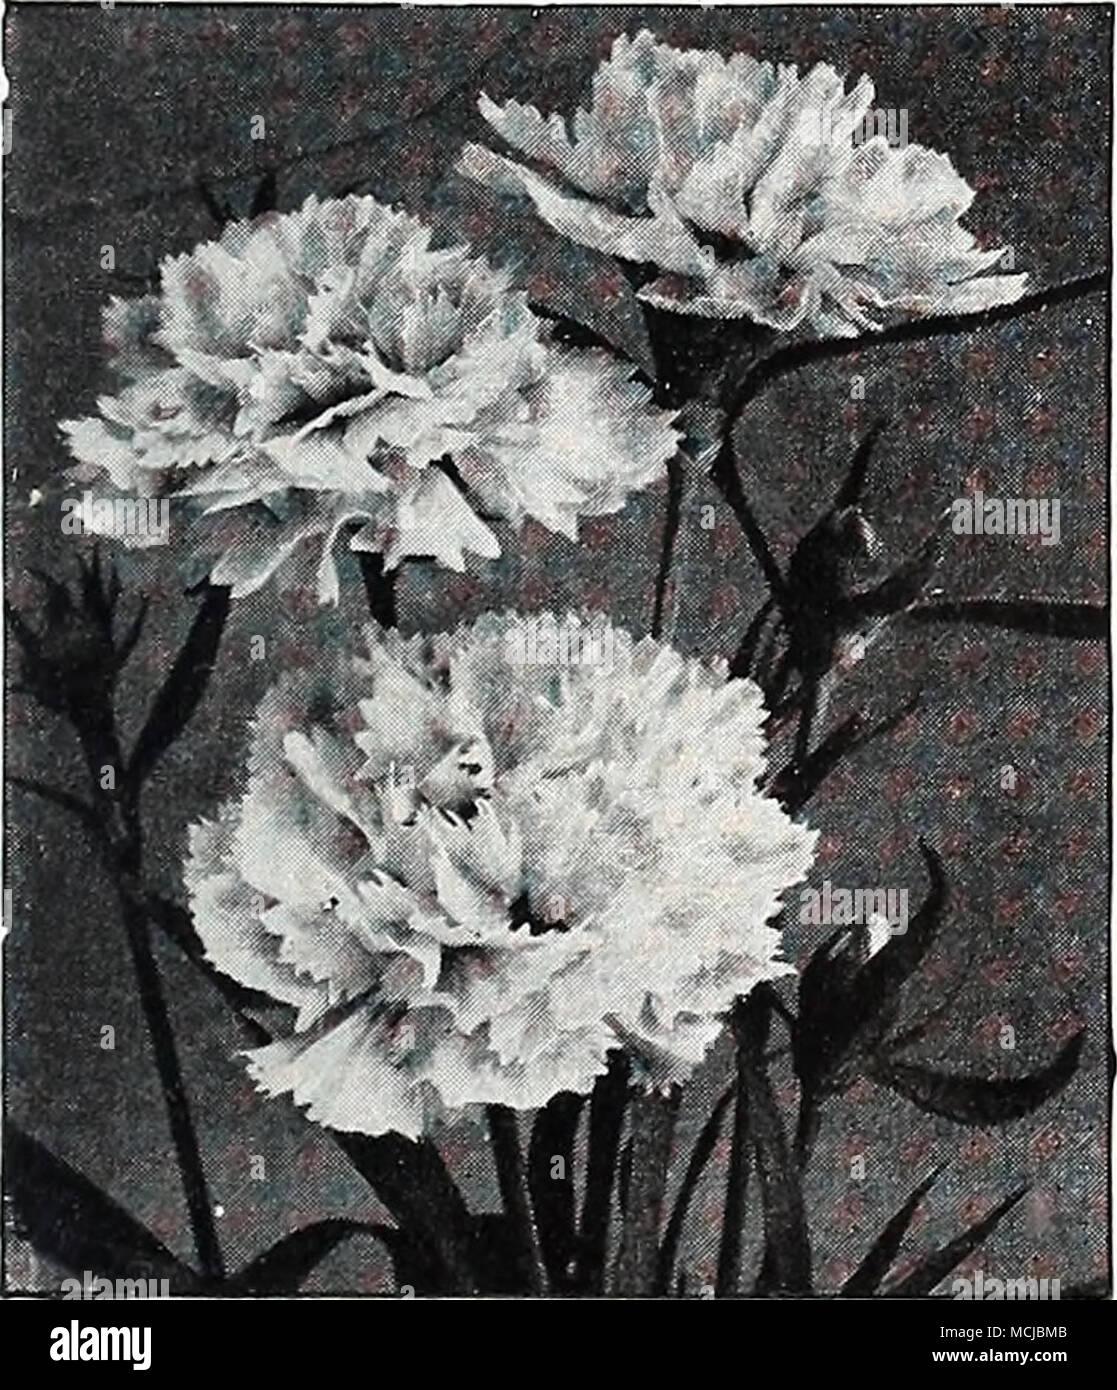 Calendula pacific beauty calliopsis hardy annuals of easiest calendula pacific beauty calliopsis hardy annuals of easiest culture cosmos like flowers in shades of yellow with mahogany markings izmirmasajfo Choice Image